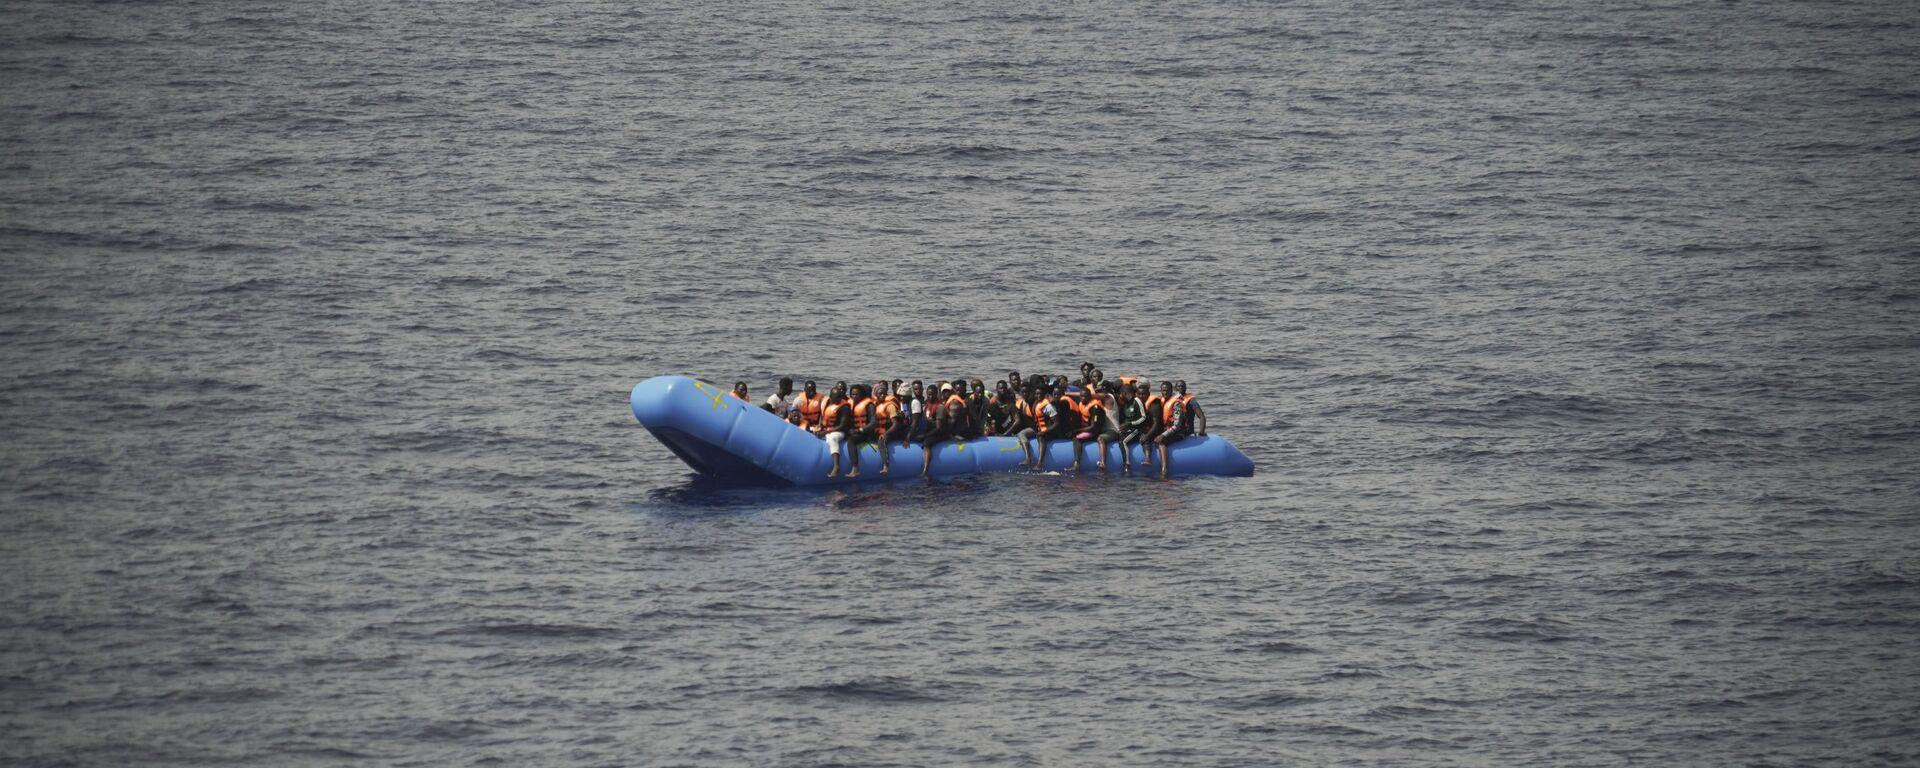 Migranti su una barca - Sputnik Italia, 1920, 07.07.2021